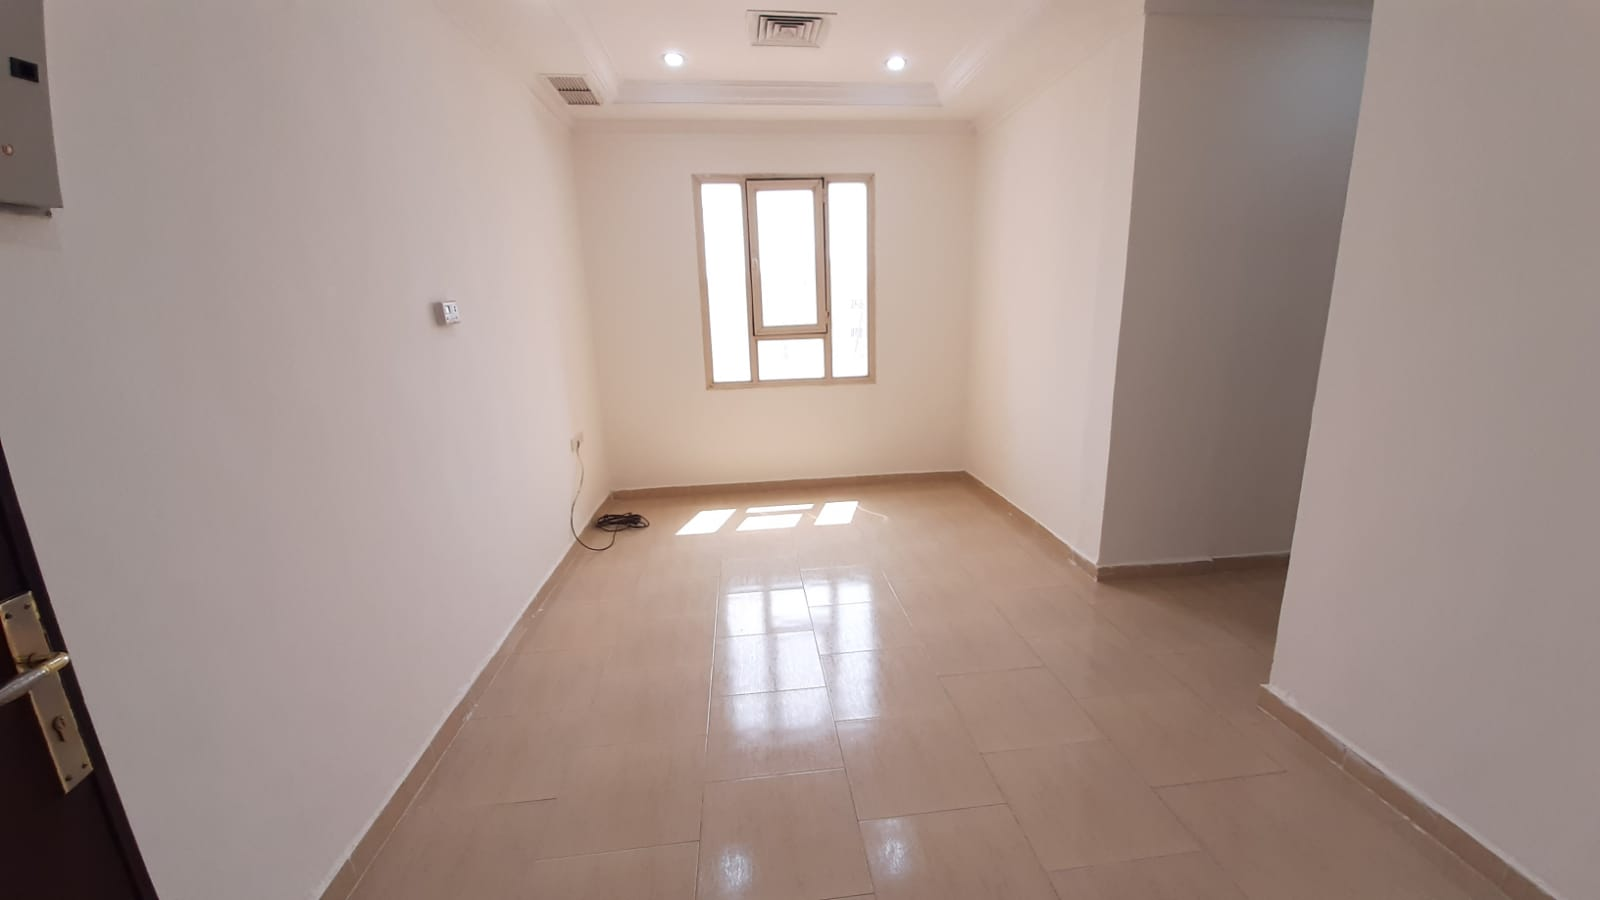 Flat for rent in munaqaf block 4